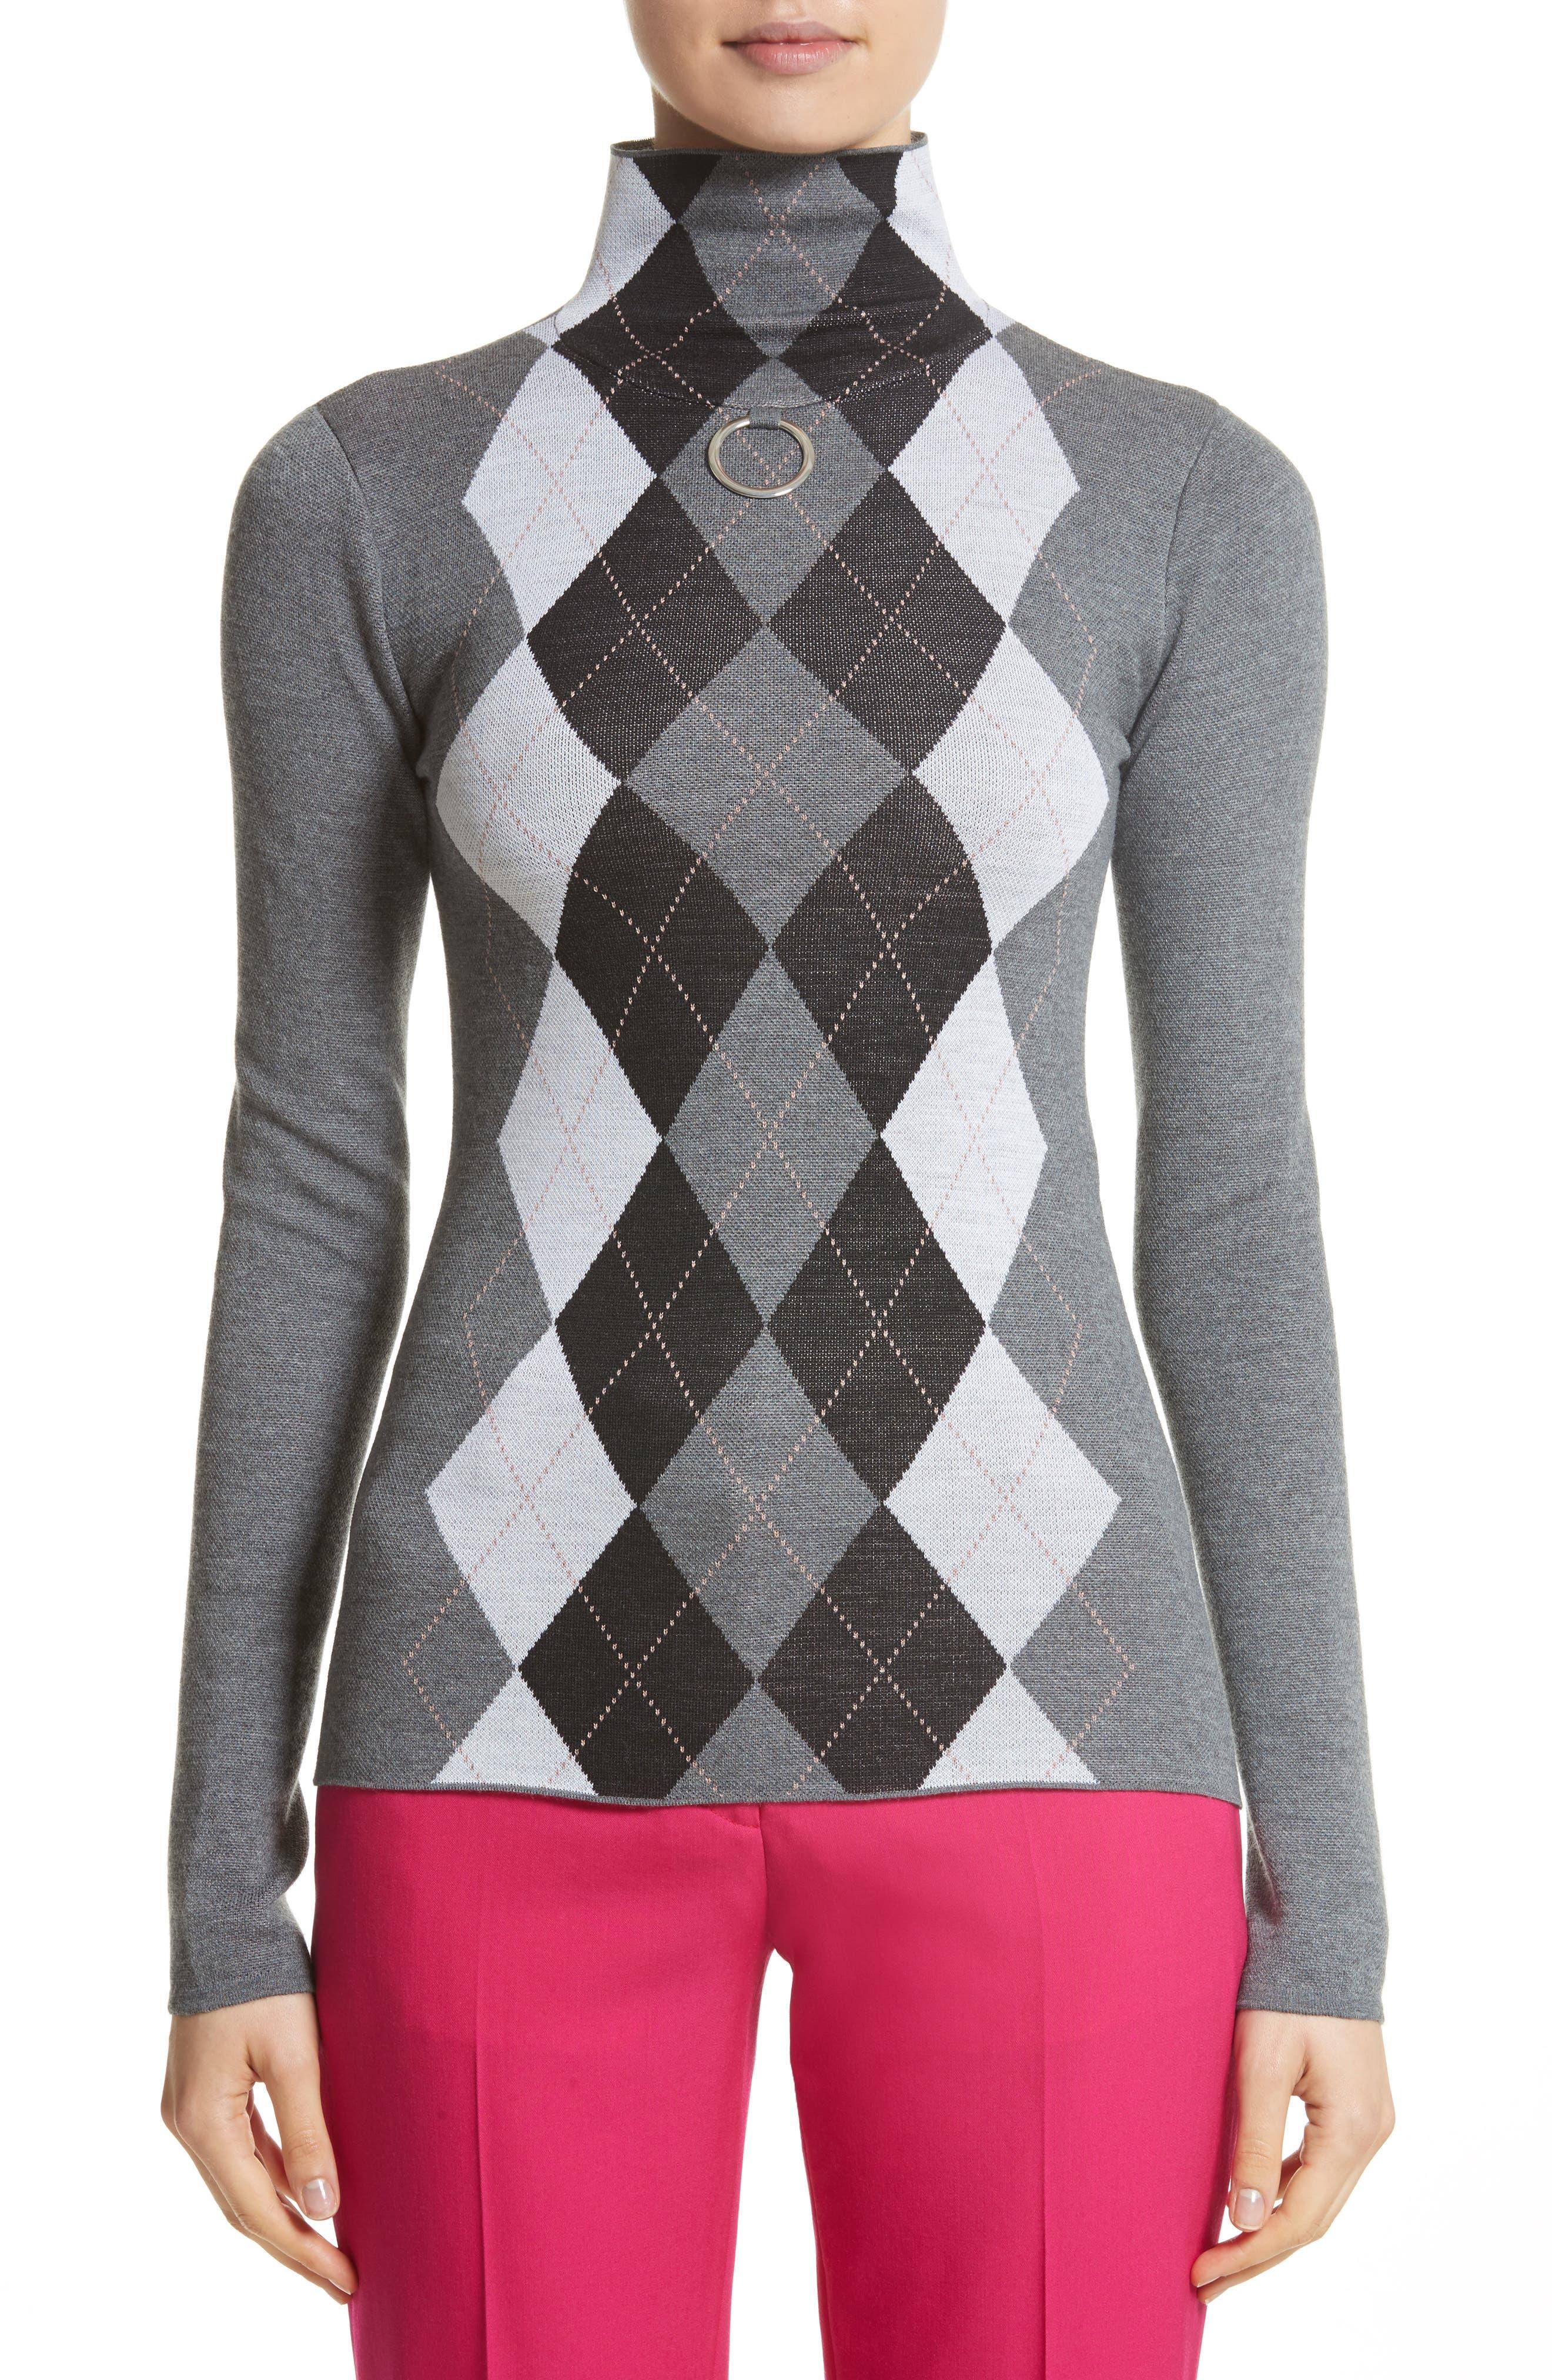 Stella McCartney Ring Detail Arygle Sweater